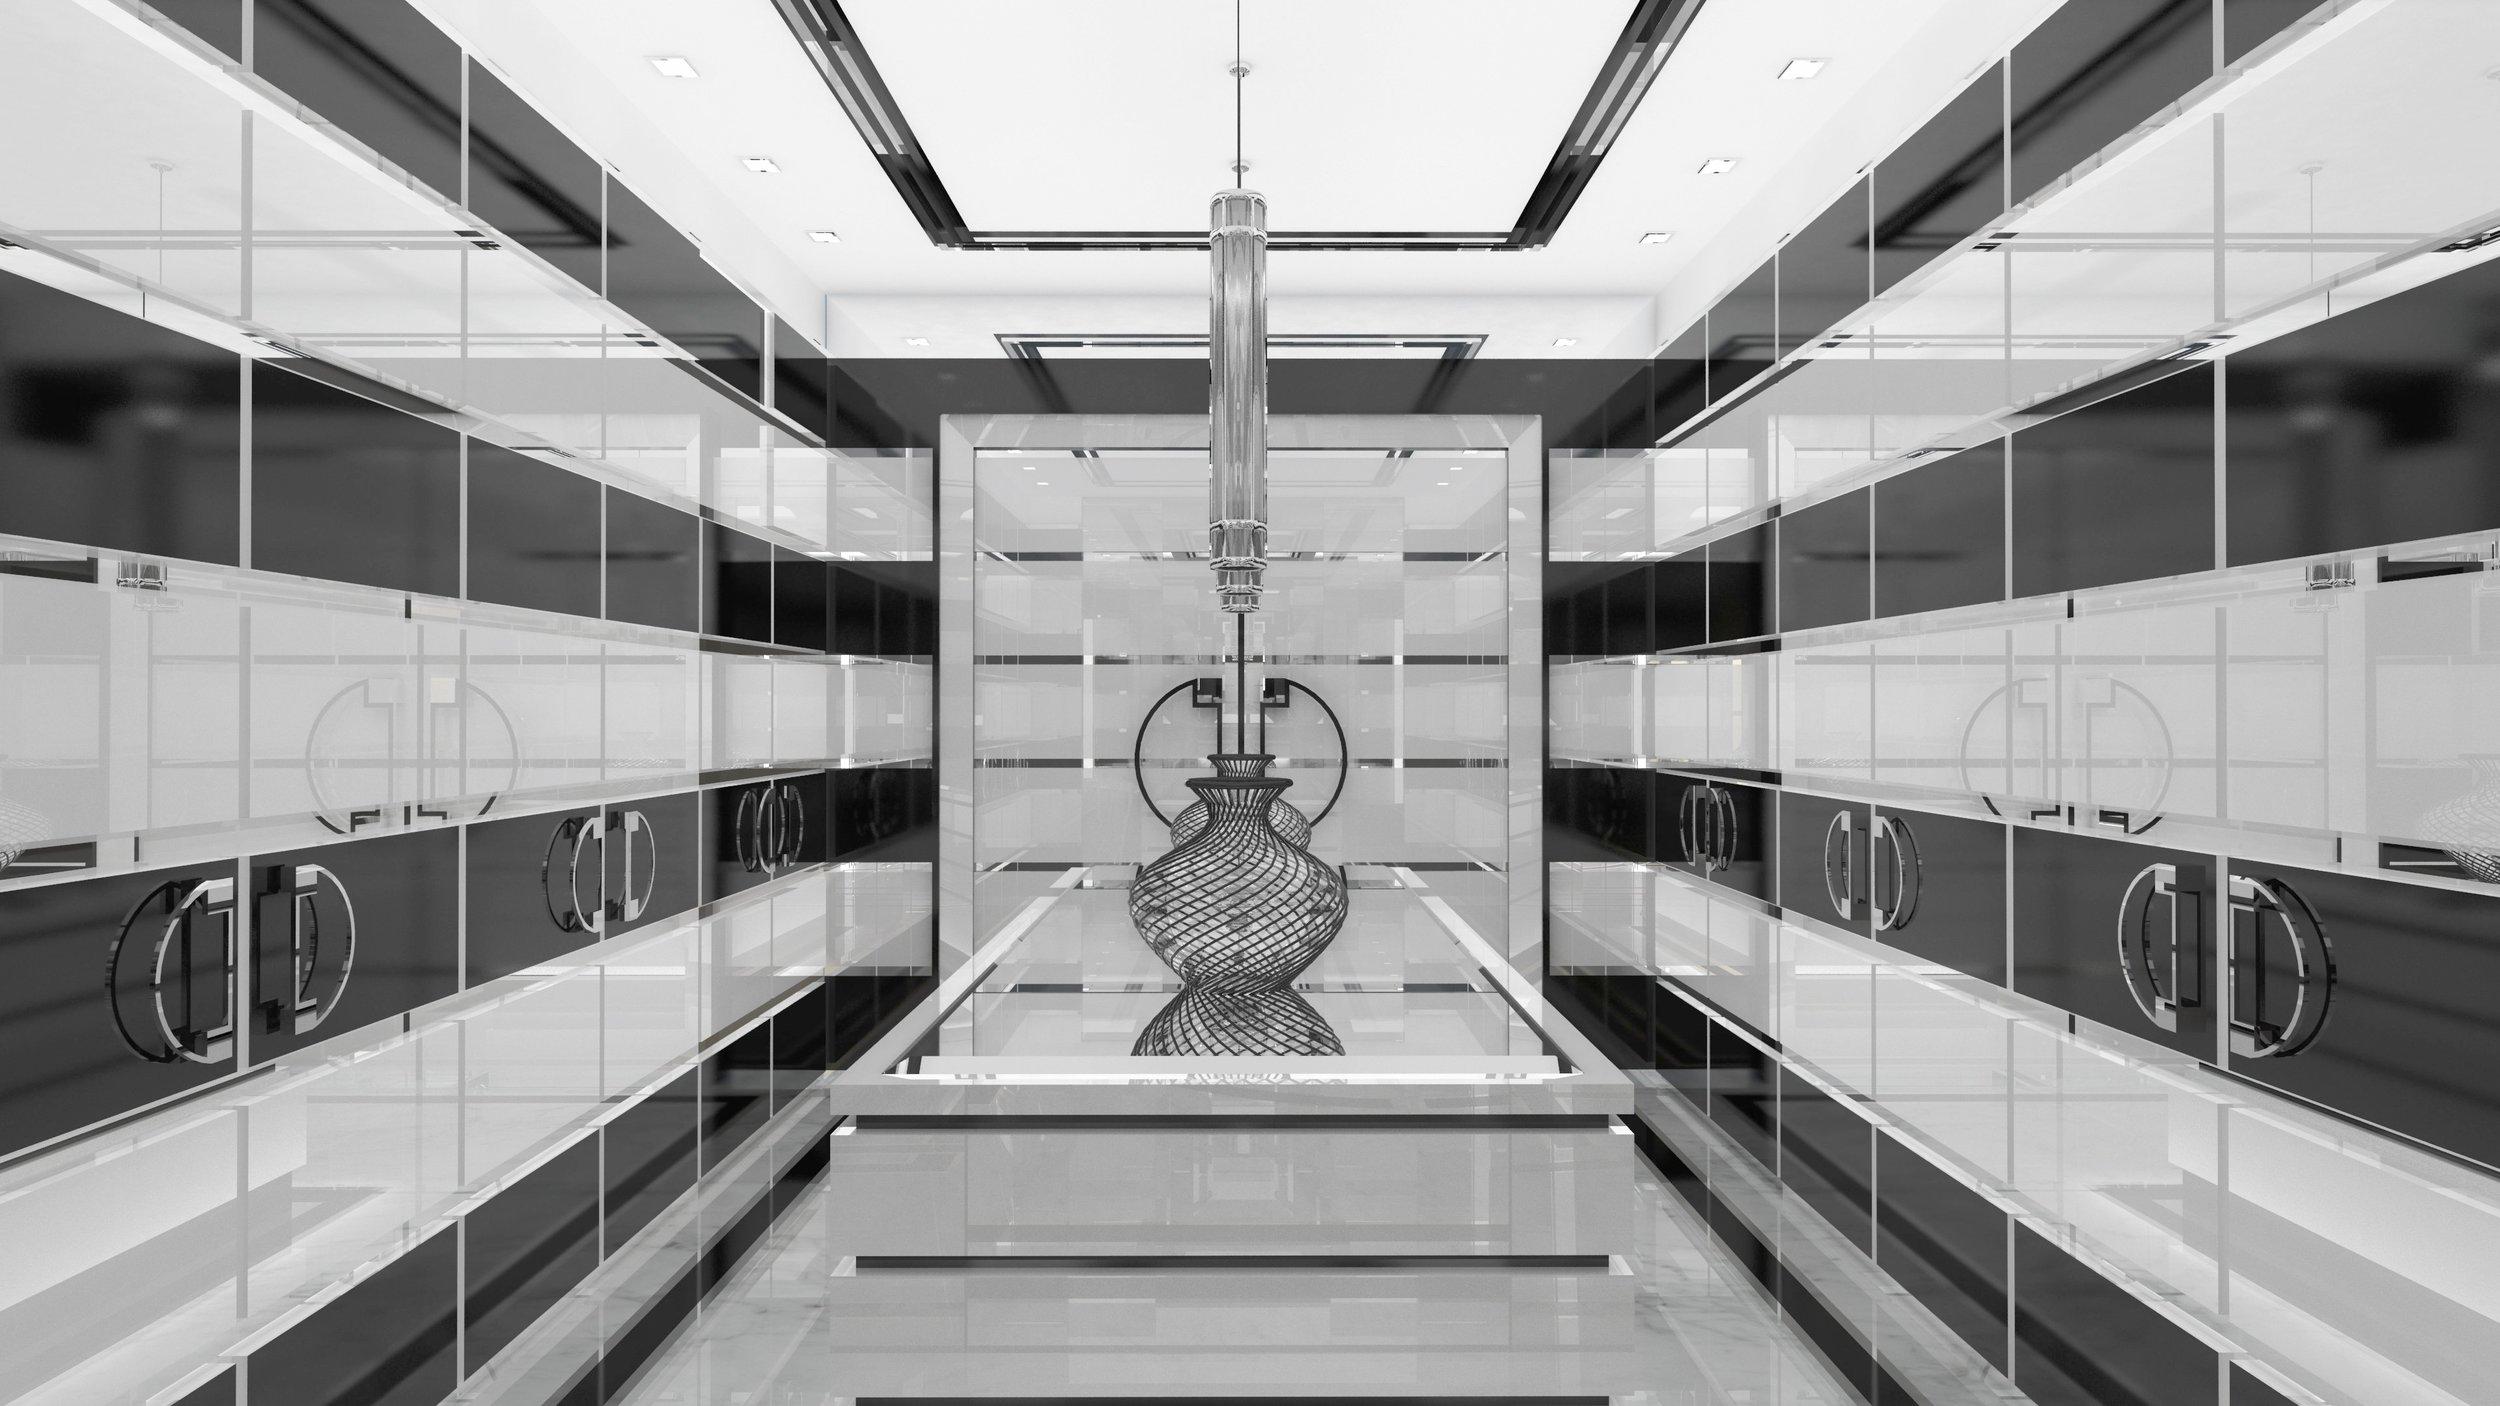 PIC 7 - ANGEL MARTIN - DESIGN PROCESS - DRESSING ROOM RENDER .jpeg